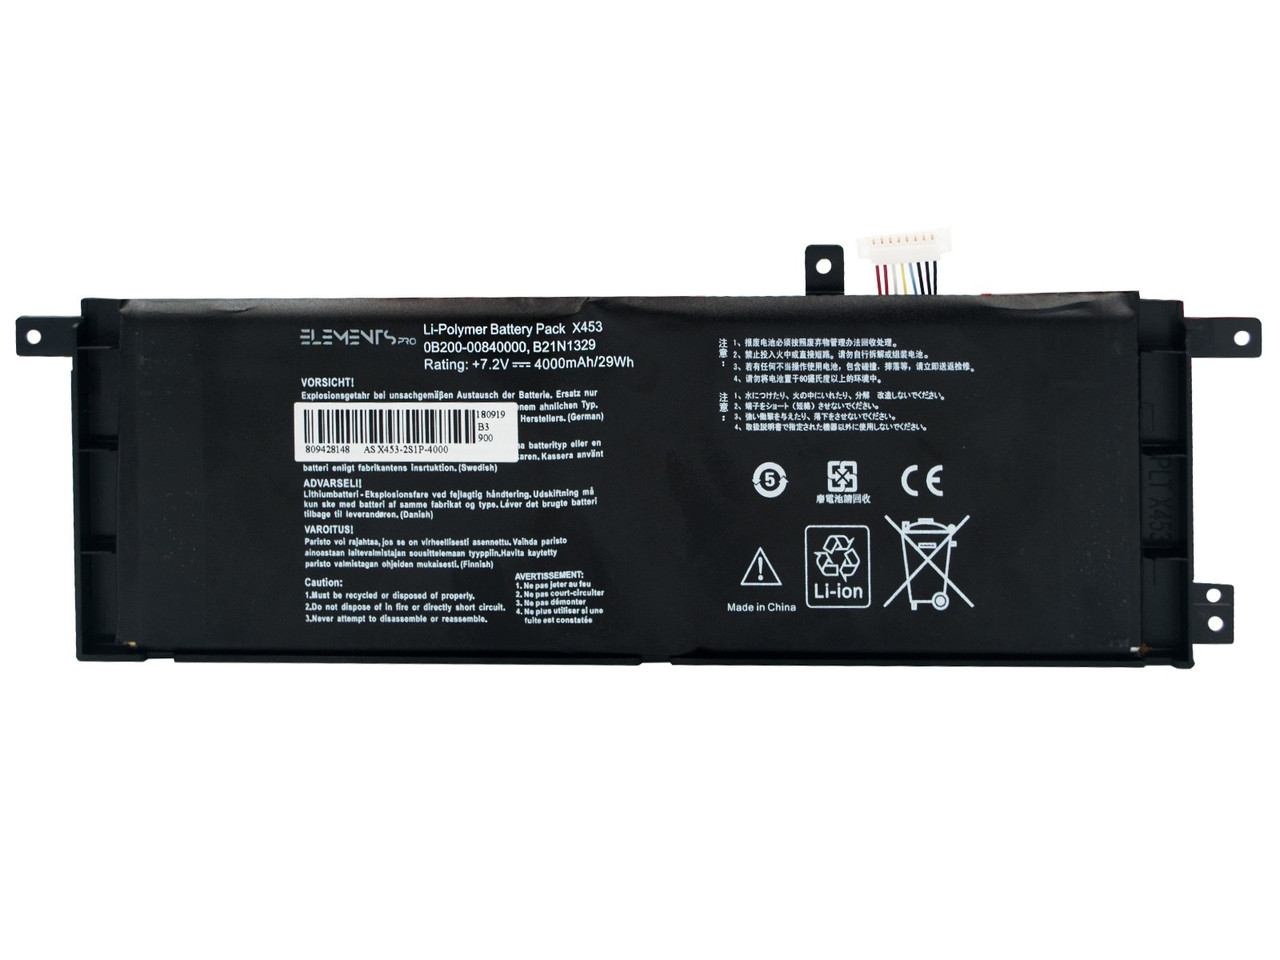 Батарея Elements PRO для Asus D553M F453M F553M K553M P553M R413M X403M X503M X453M X553M 7.2 V 4000mAh (X453-2S1P-4000)